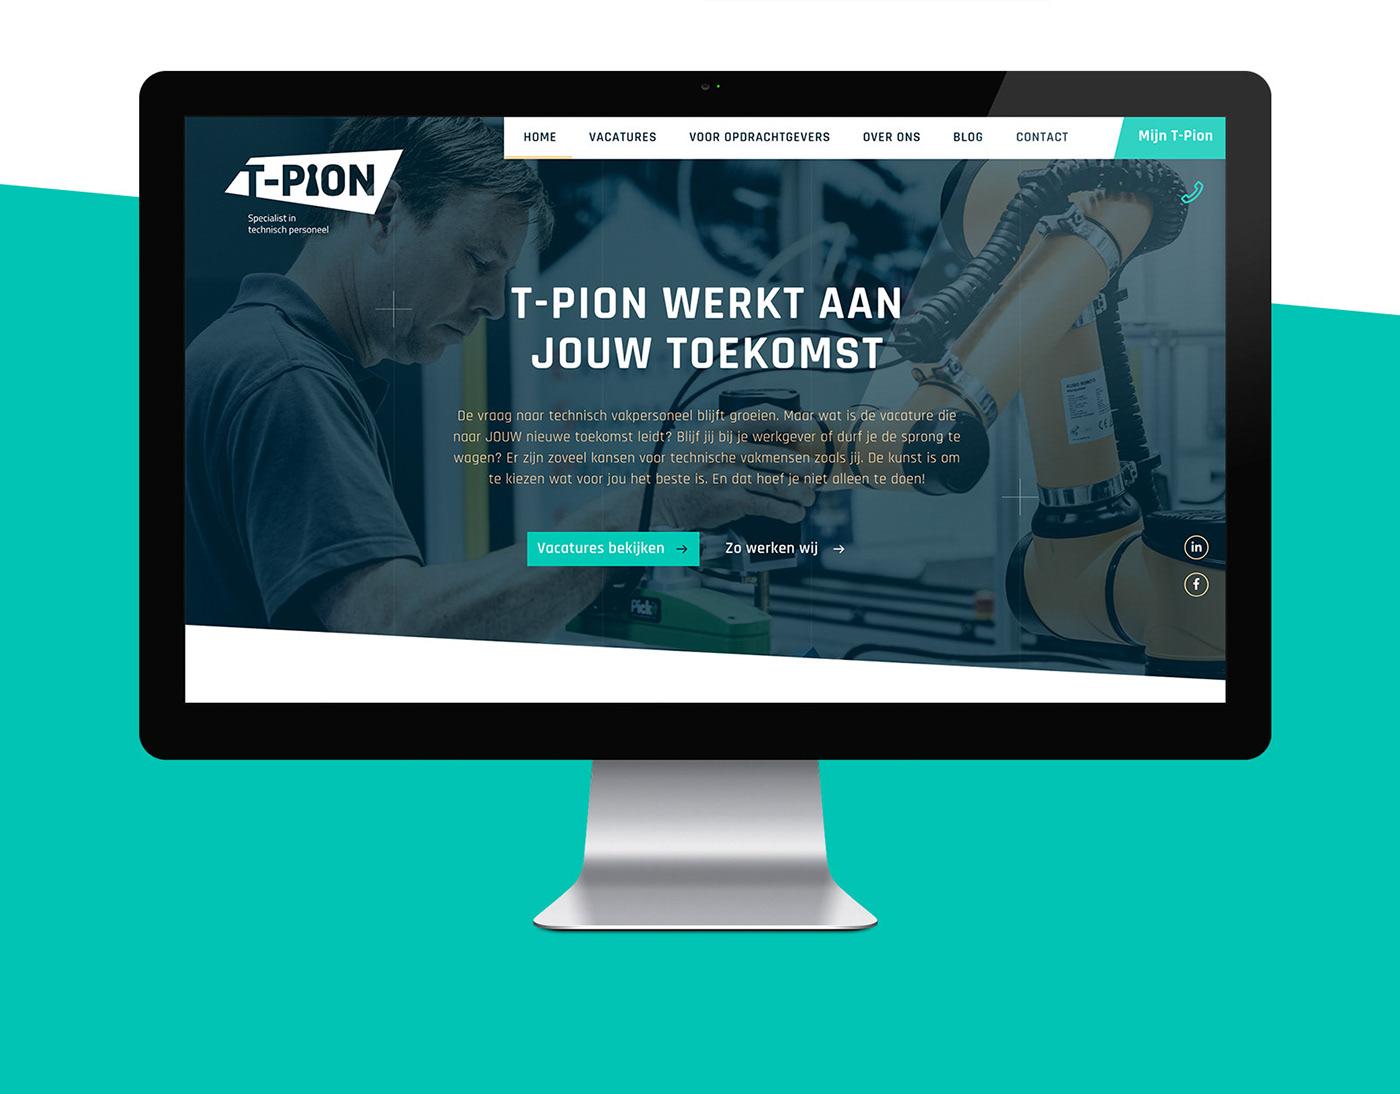 logo branding  uidesign copy Webdesign Photography  verhicle design cardesign campagne